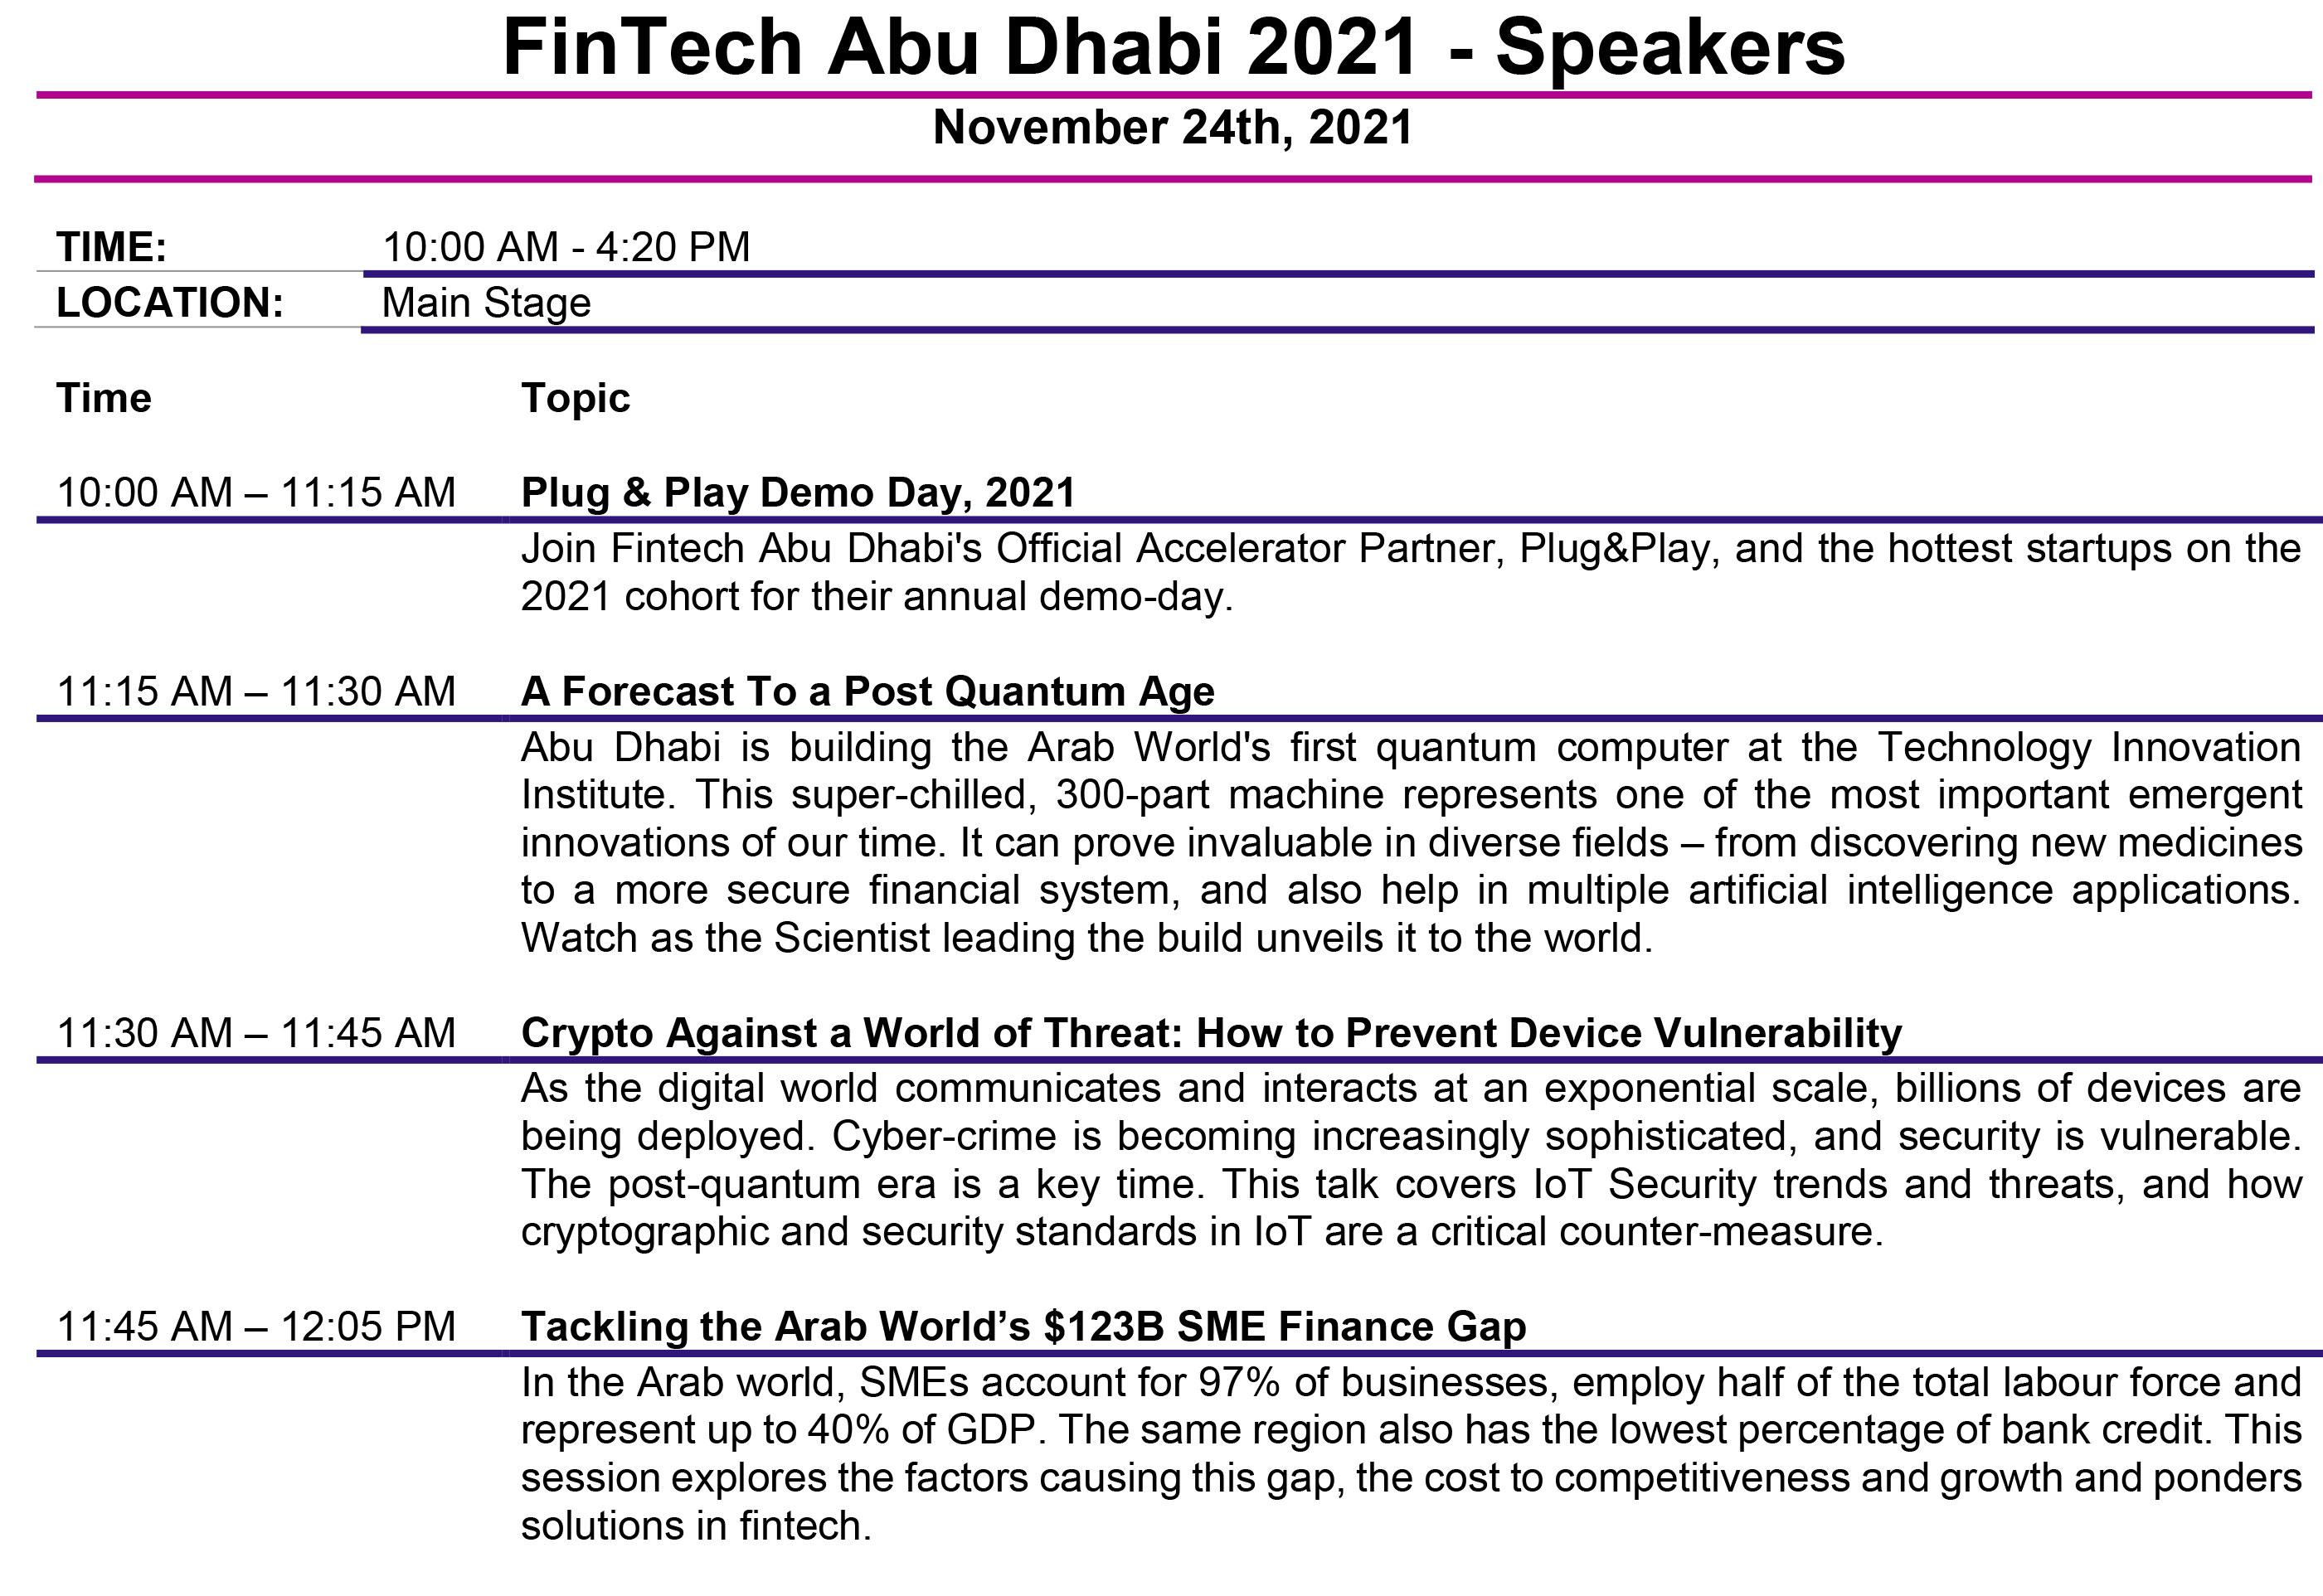 Fintech Abu Dhabi Agenda